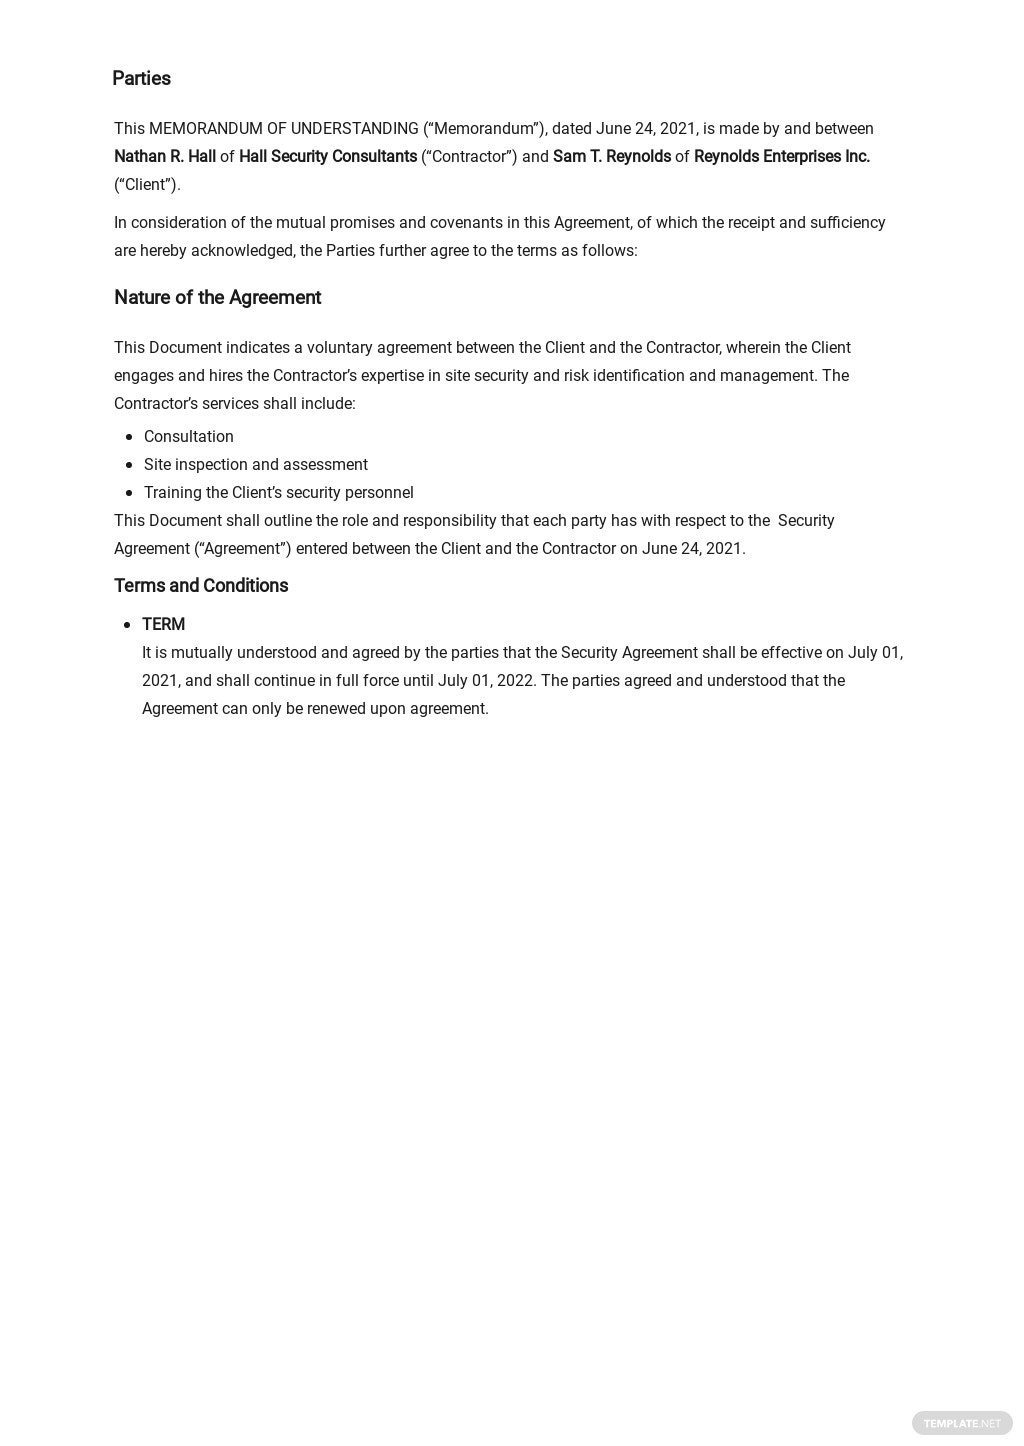 Sample Memorandum of Understanding Template 1.jpe